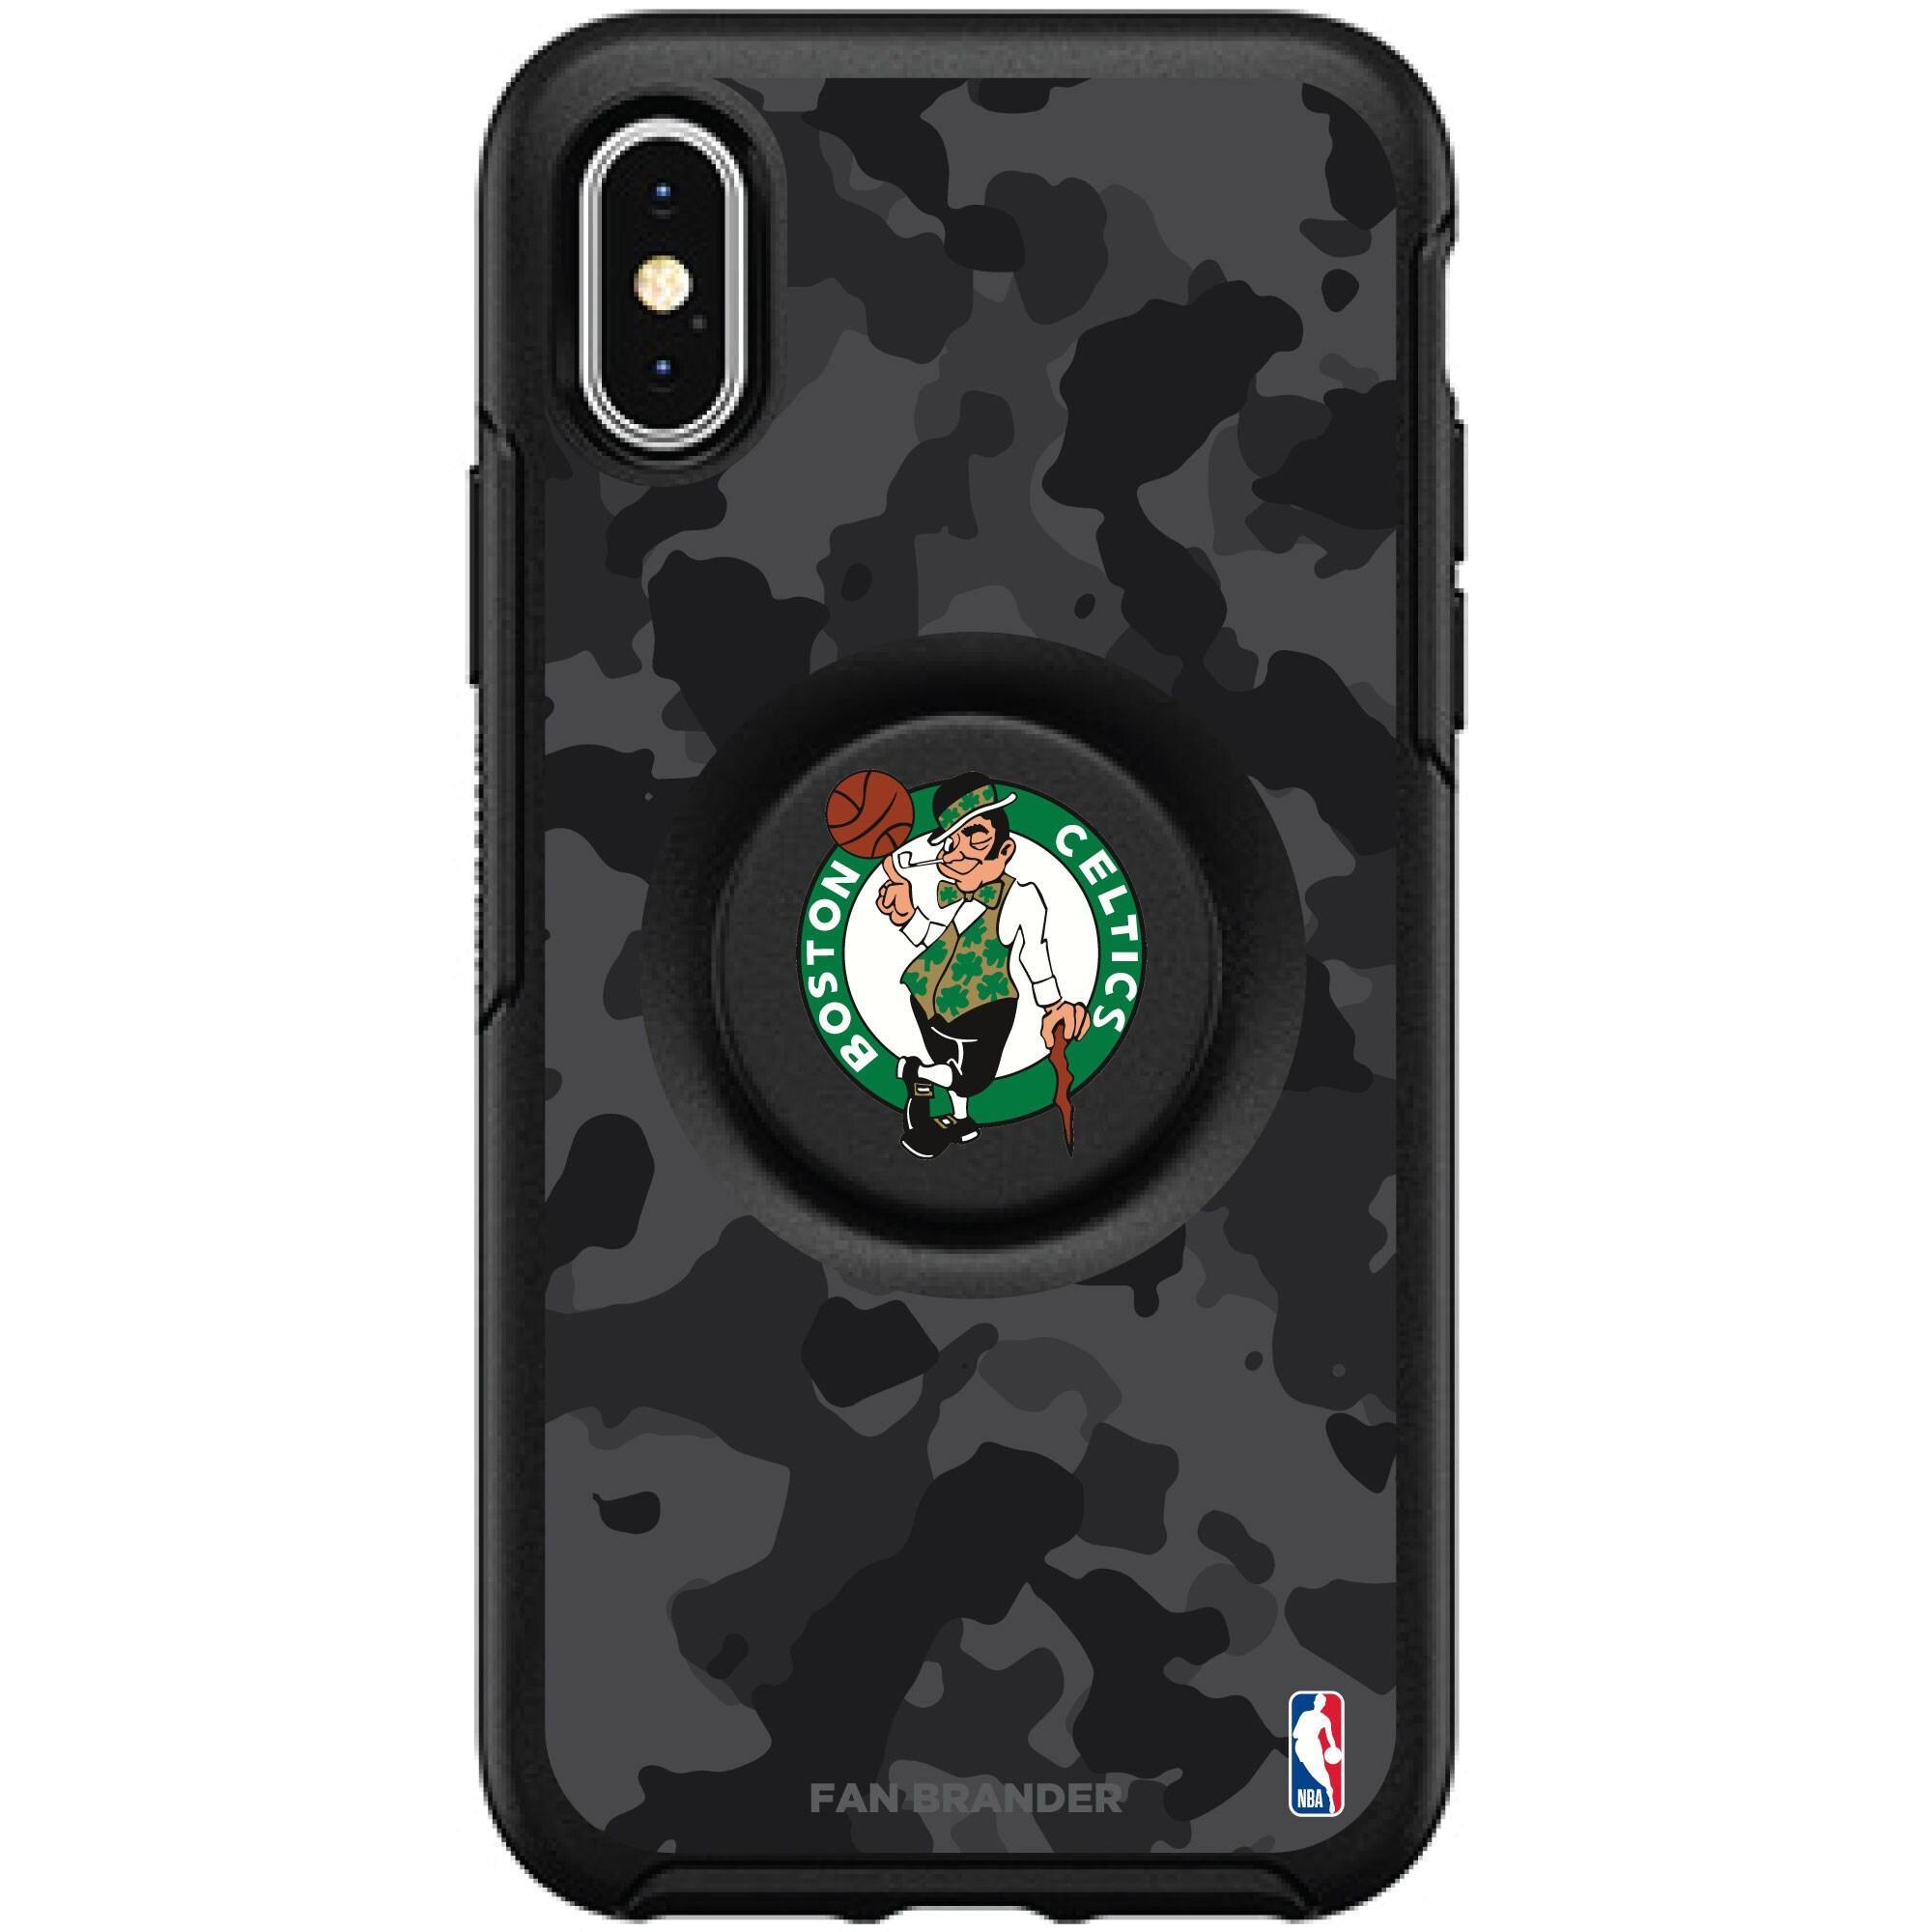 Boston Celtics OtterBox Otter + PopSocket Symmetry Urban Camo iPhone Case